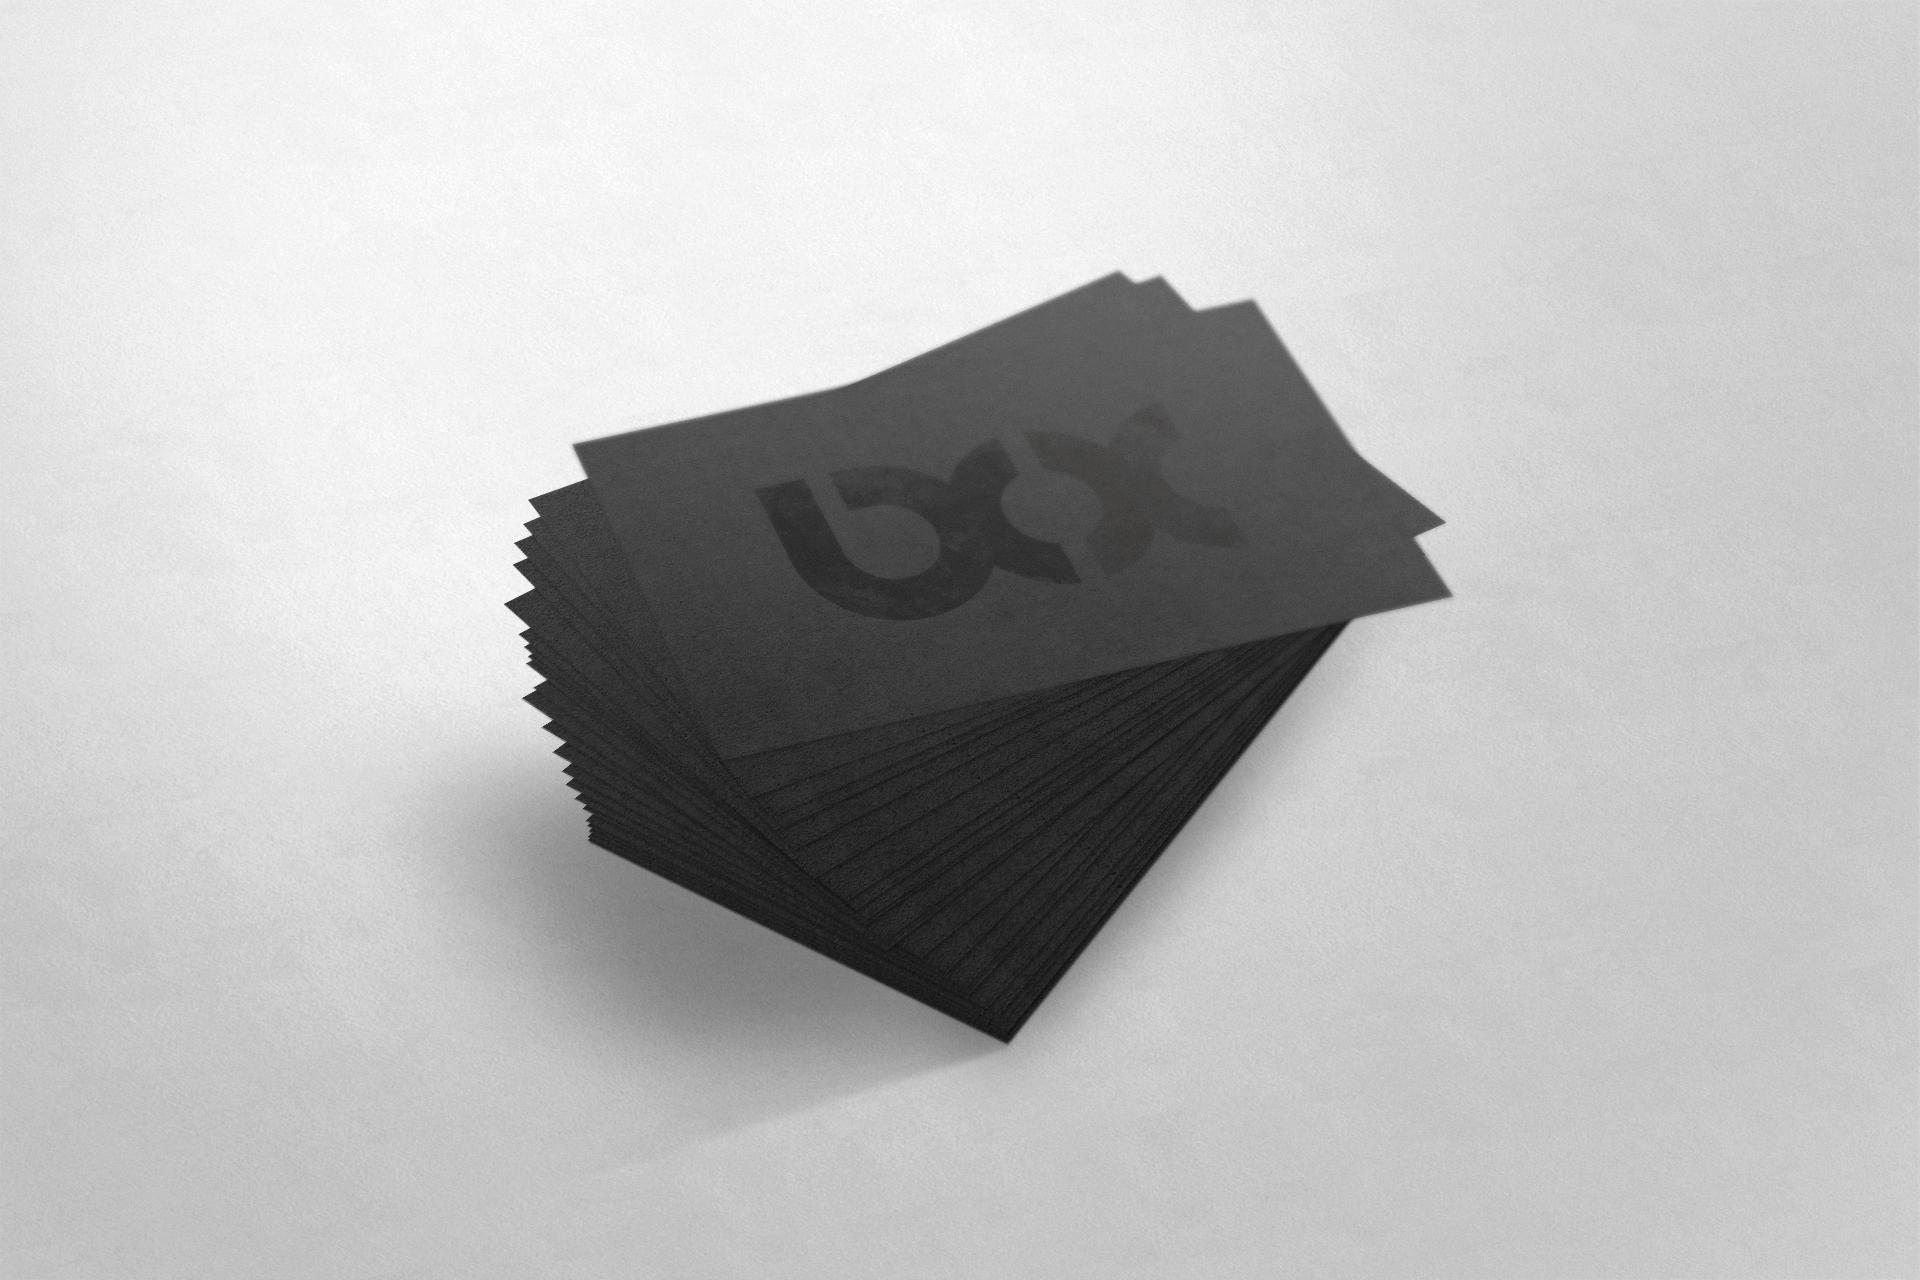 014-the-box-bonjourmolotov-logo-logotype-logotipo-grupo-fotografia-photography-group-graphic-design-grafico-branding-02-N.jpg